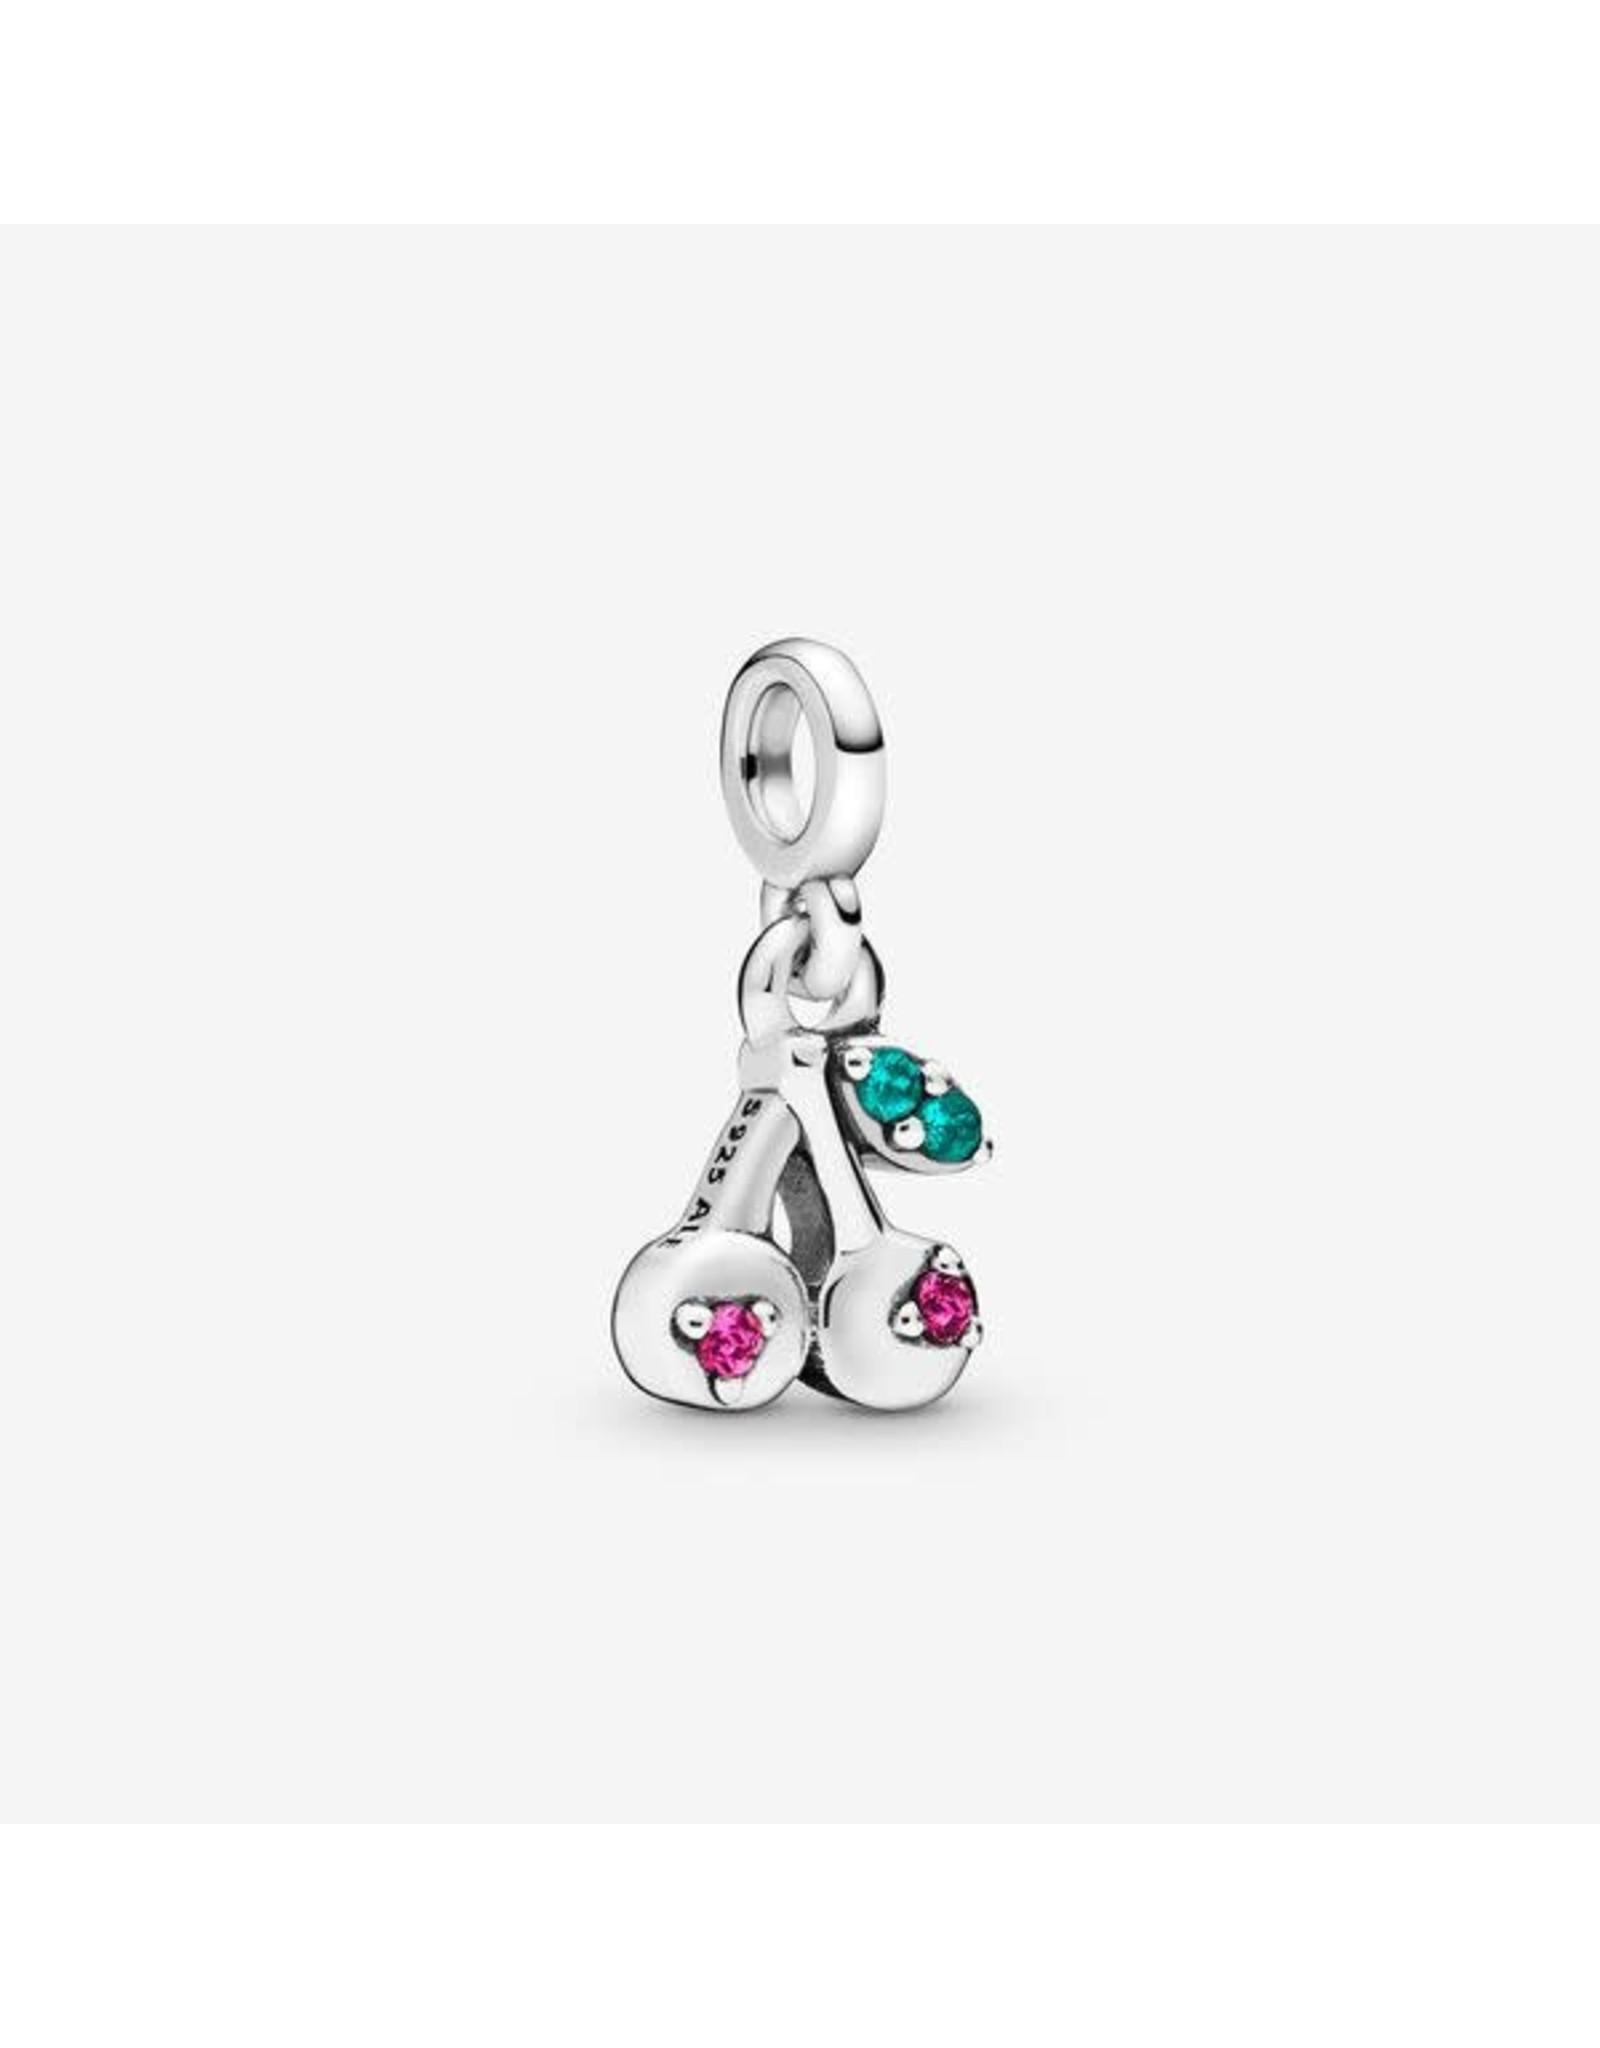 Pandora Pandora Me Charm, My Cherry, Cerise & Green Crystal